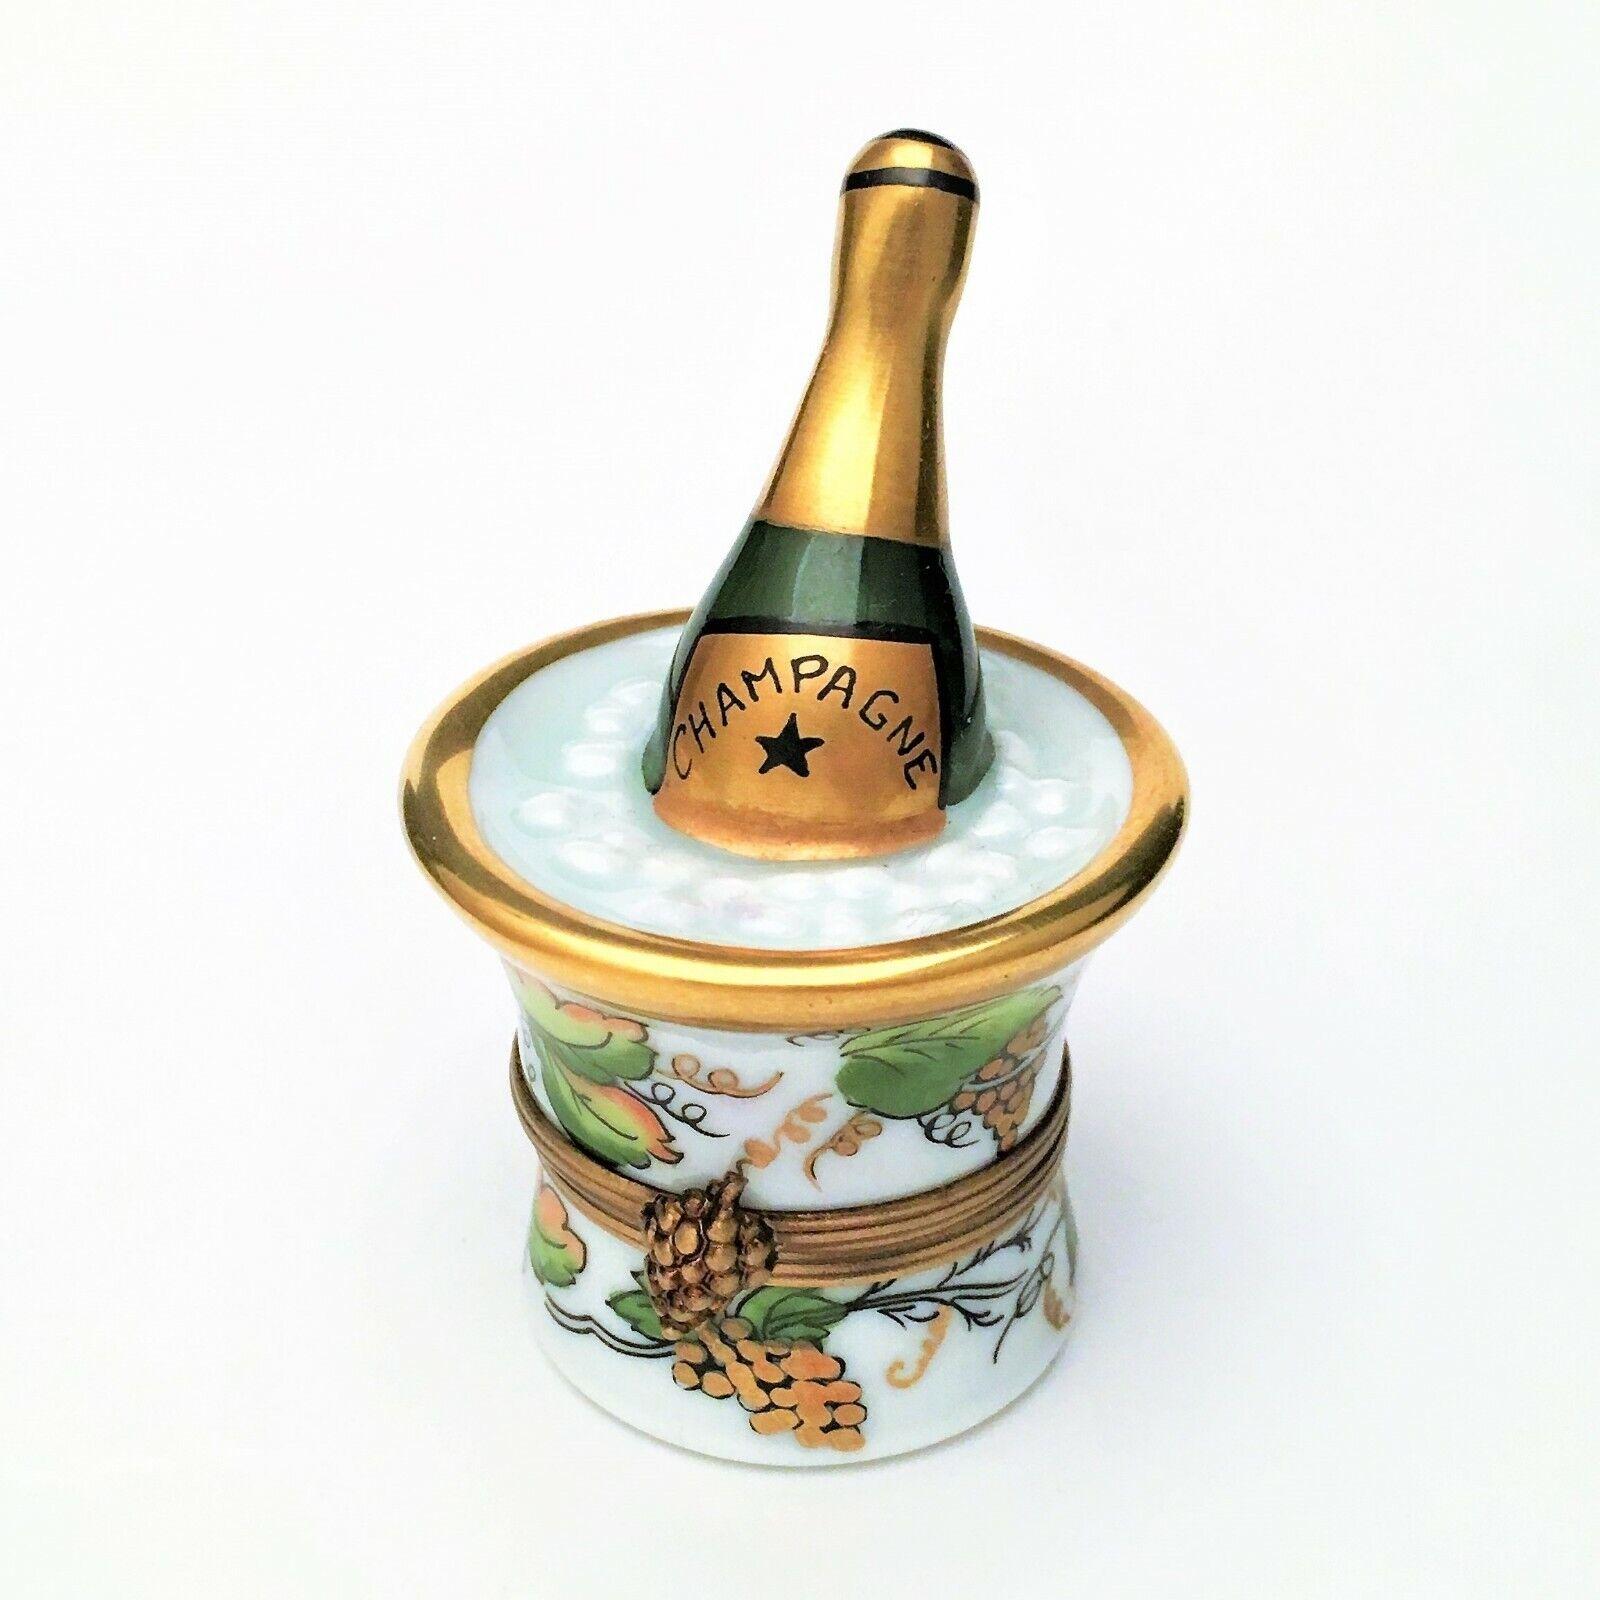 Retirado De Porcelana De Limoges Caja de la baratija, botella de champán en Cubo de Hielo, firmado